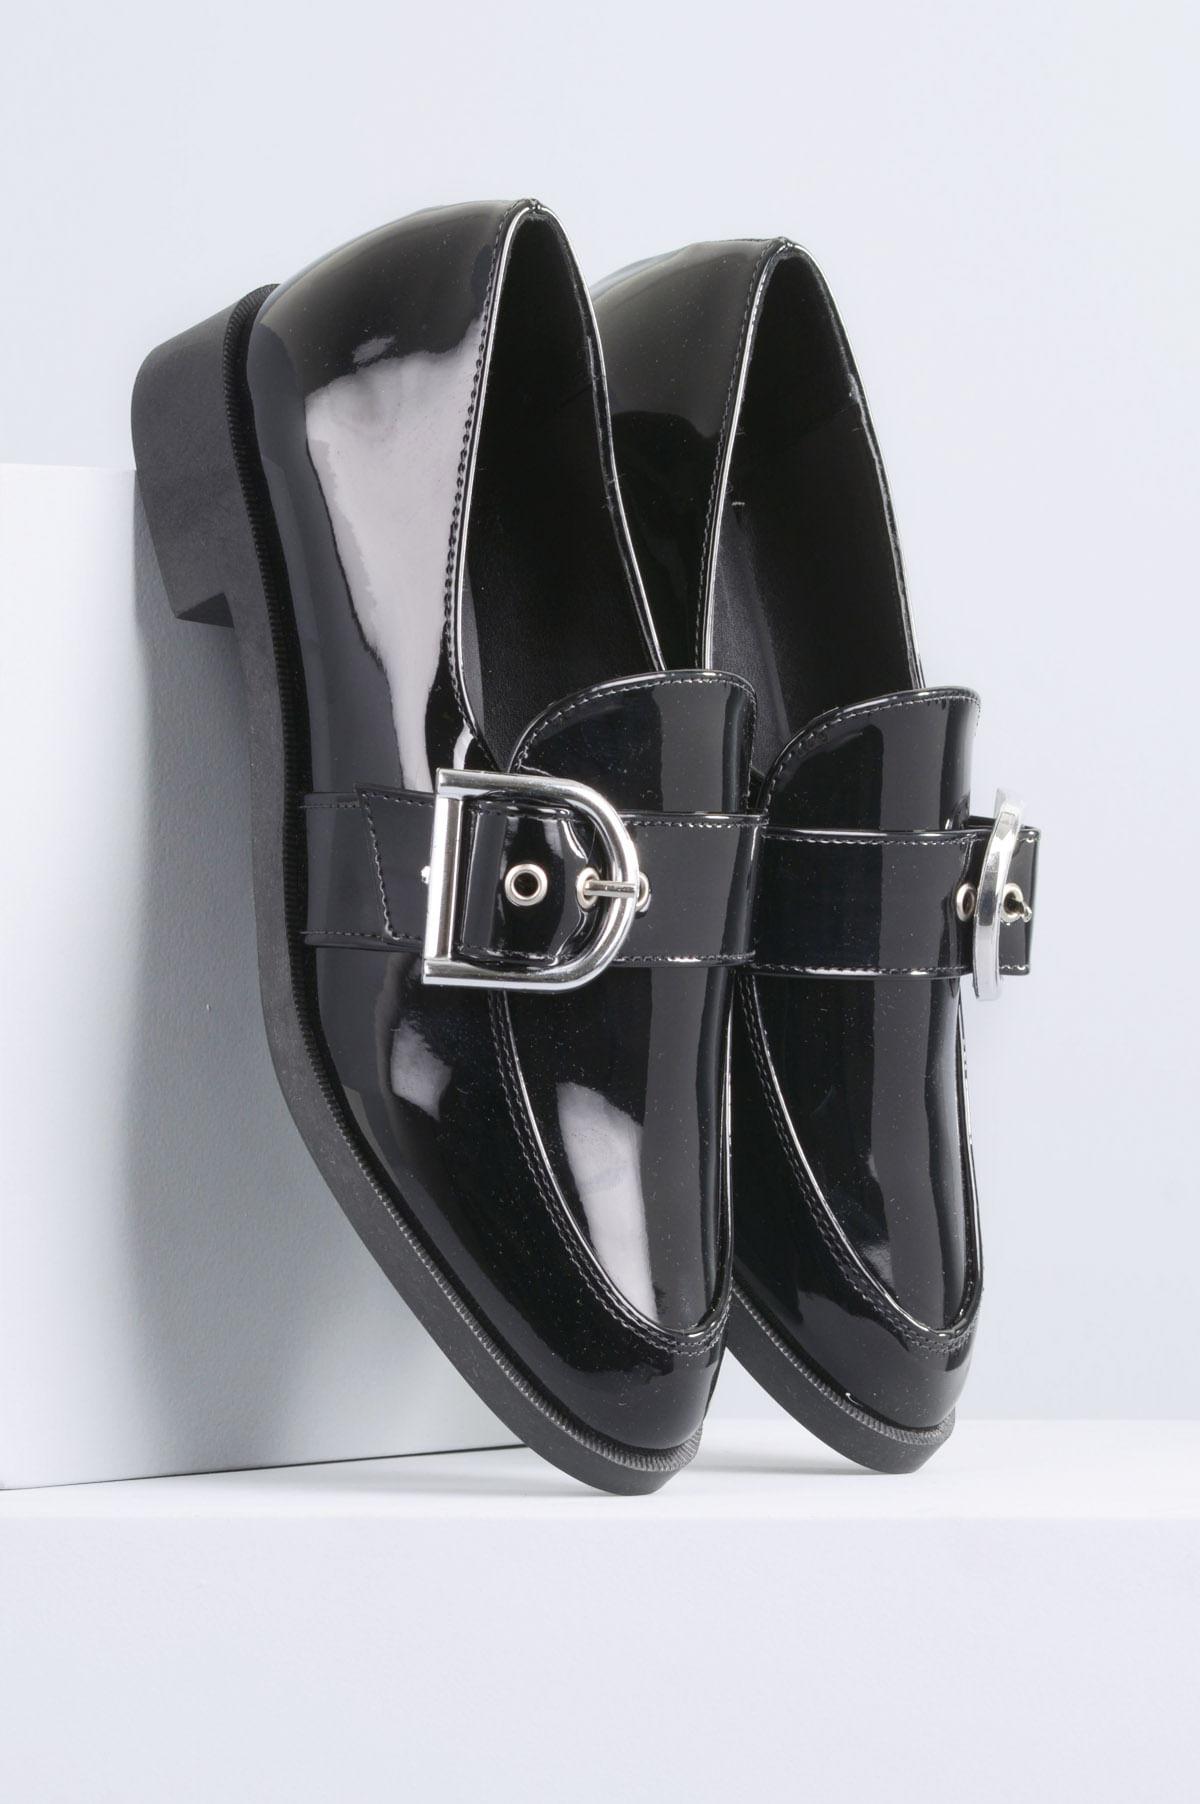 376e63fed Sapato Feminino Salto Baixo Ayala Mundial VERNIZ PRETO - Mundial ...